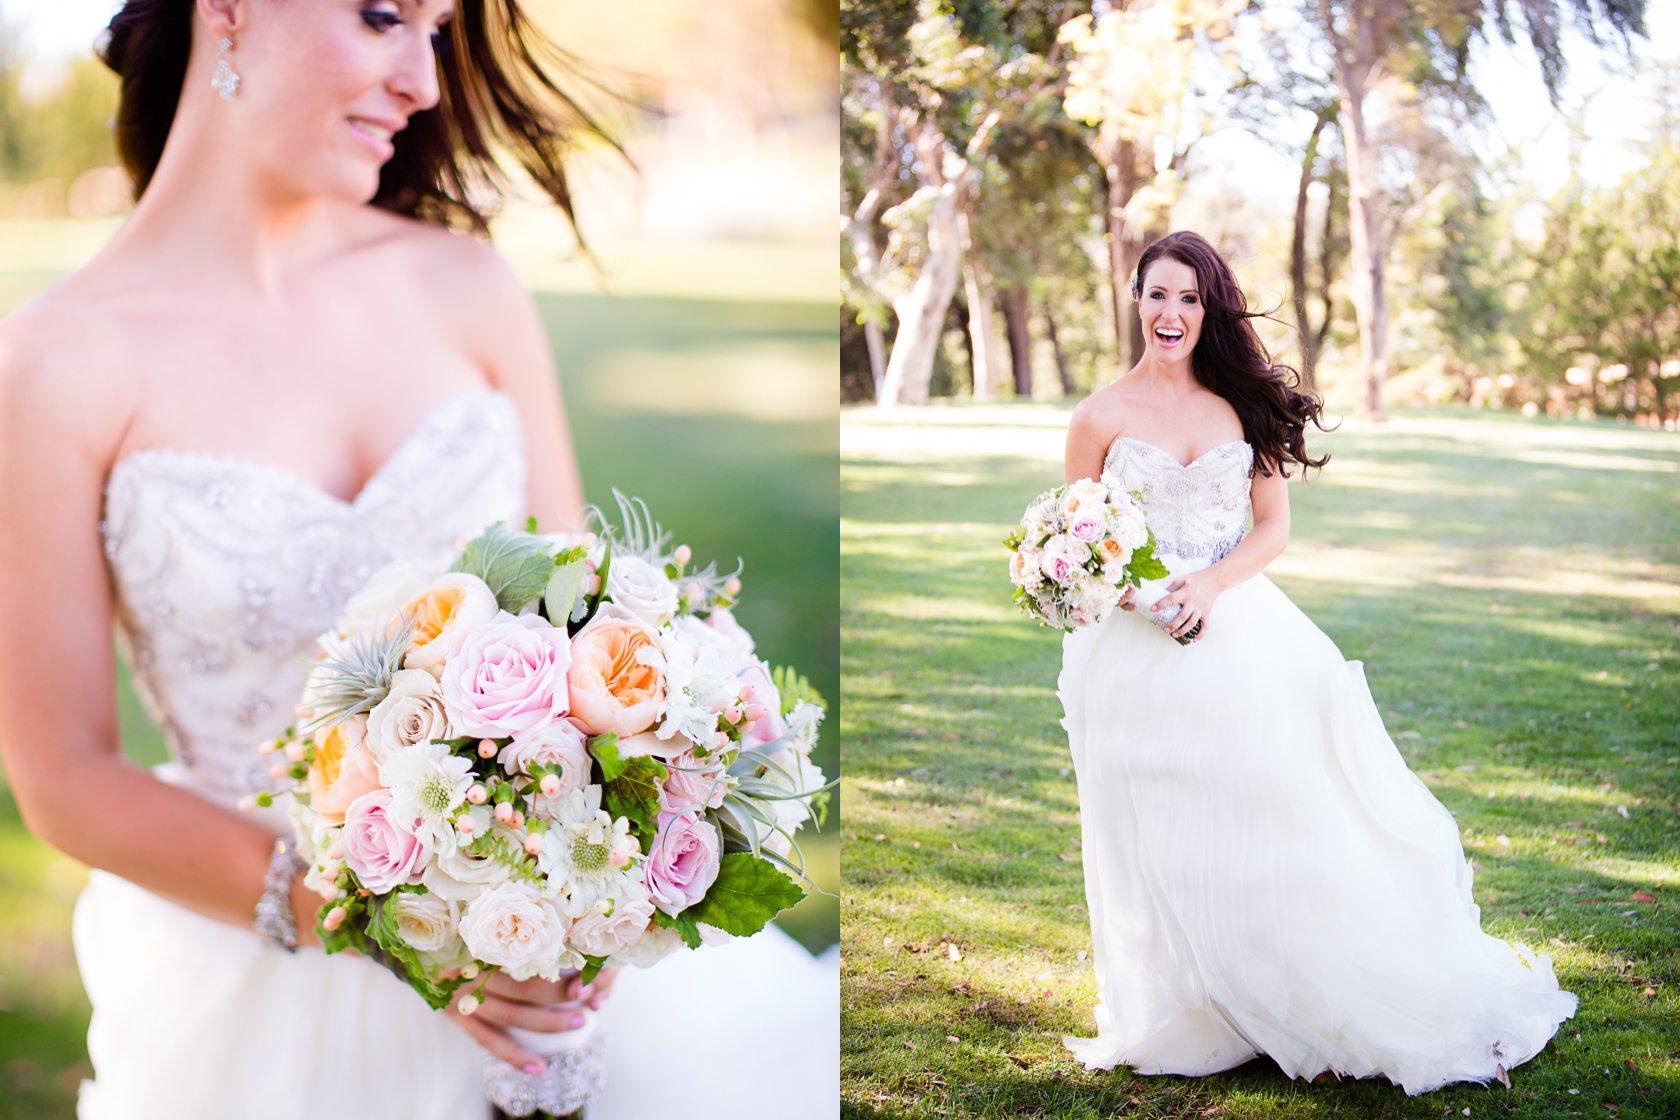 Temecula_Creek_Inn_Wedding_045.jpg